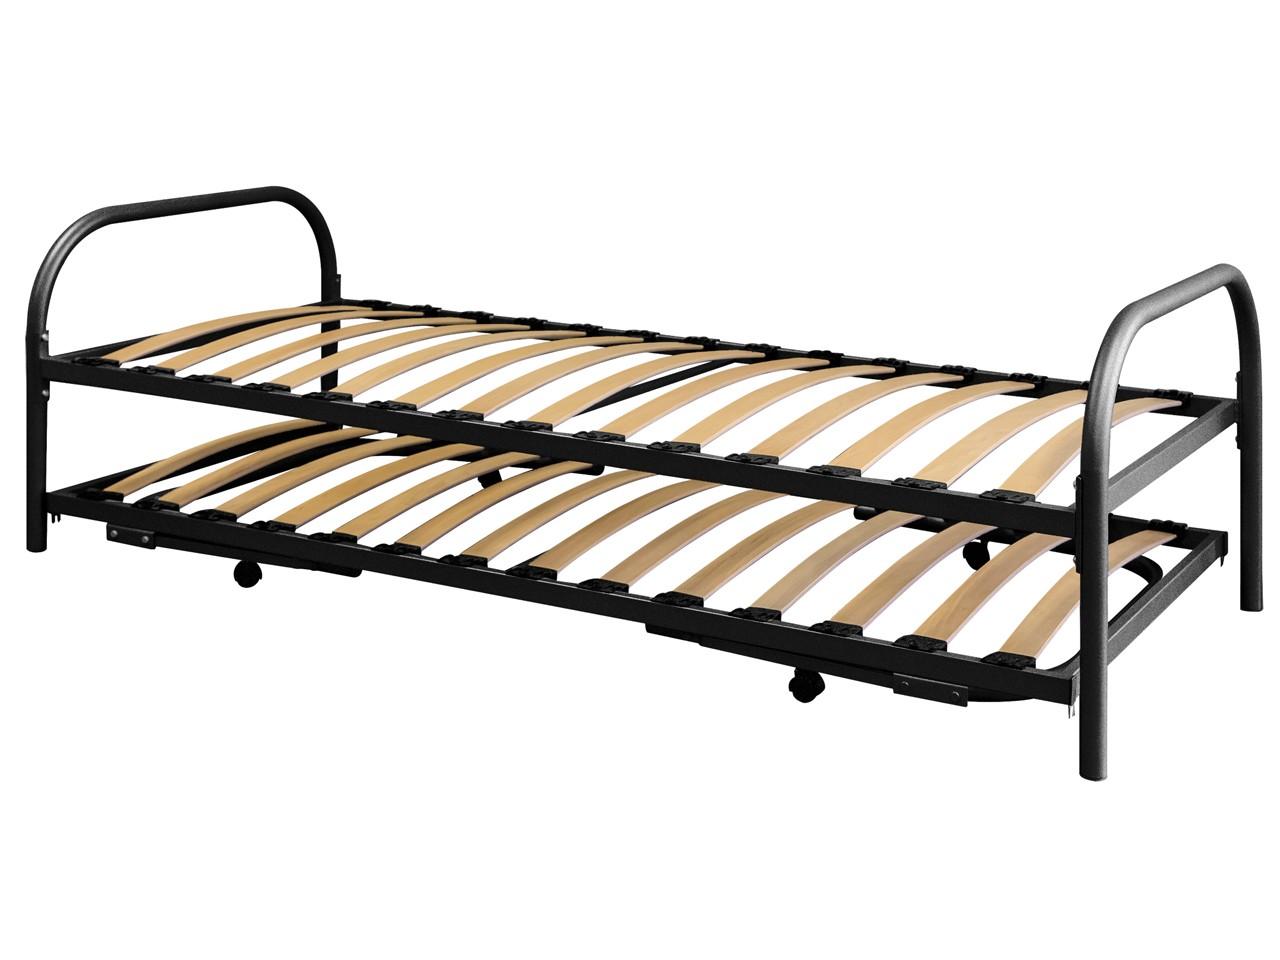 Bed Box Gästebett UB 200 90x200